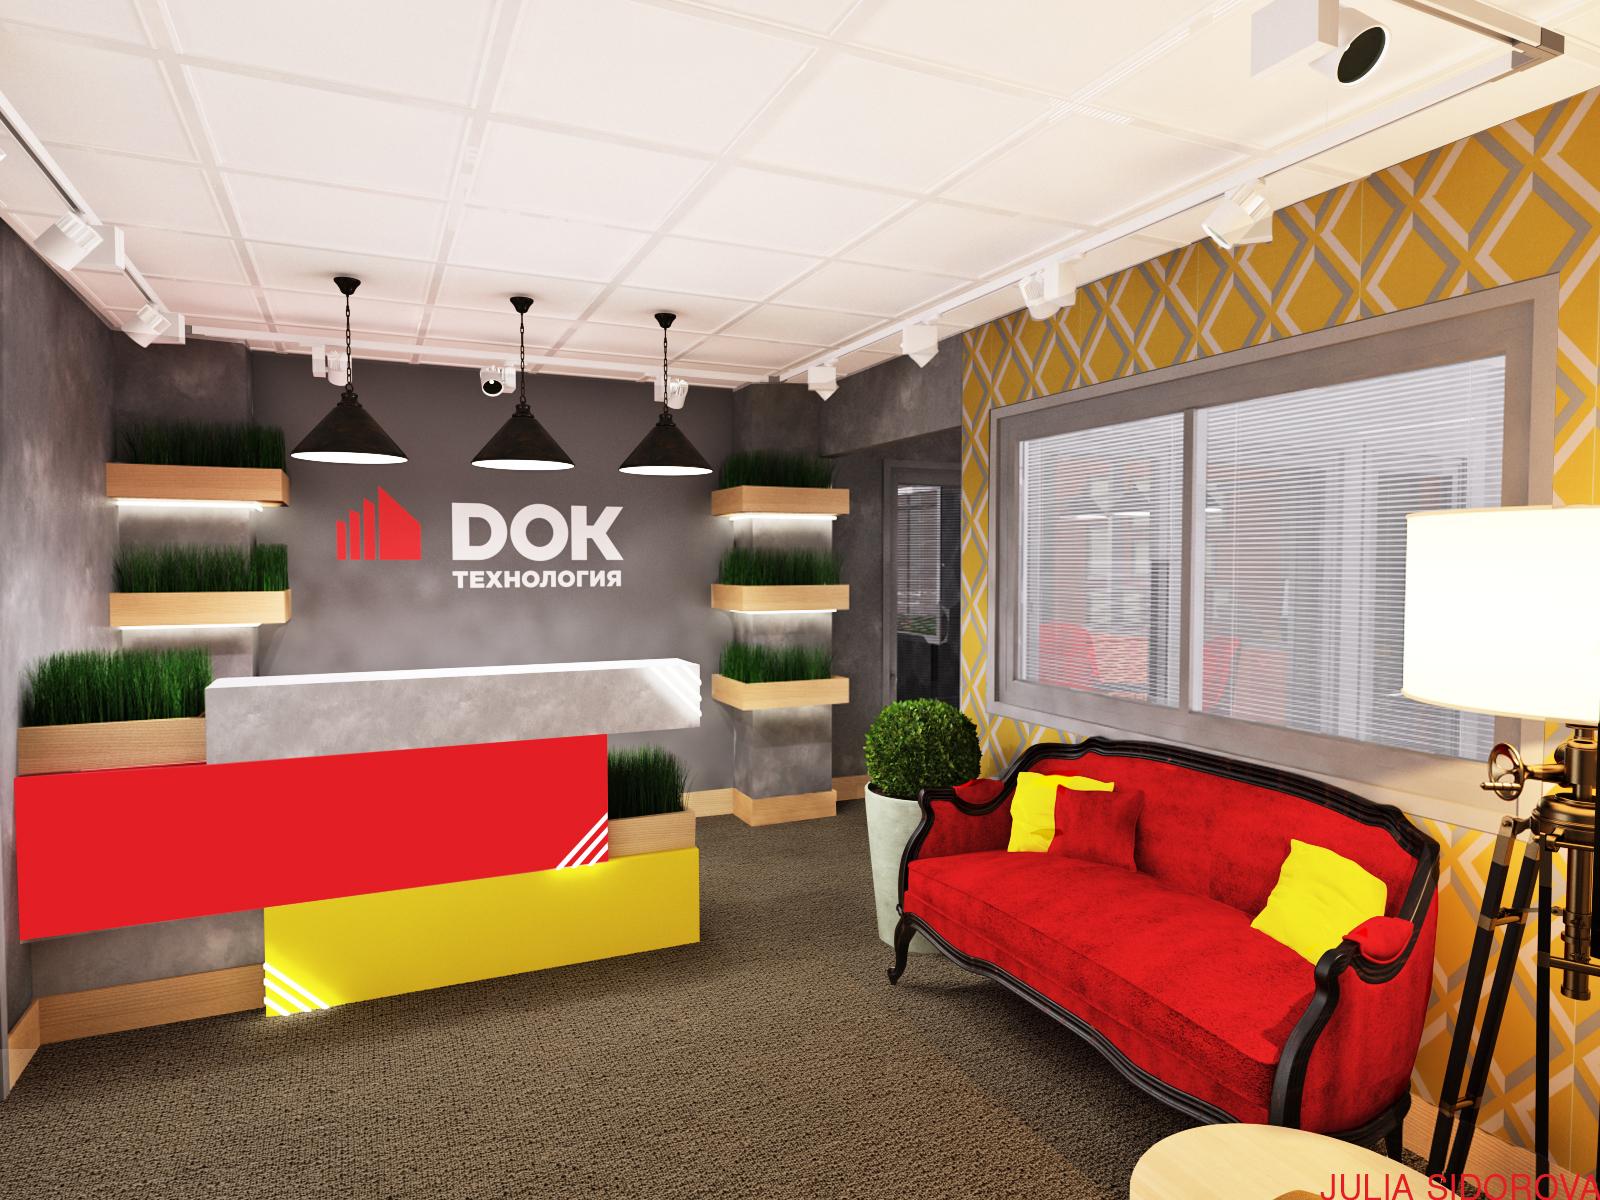 Проект офиса компании Док технология